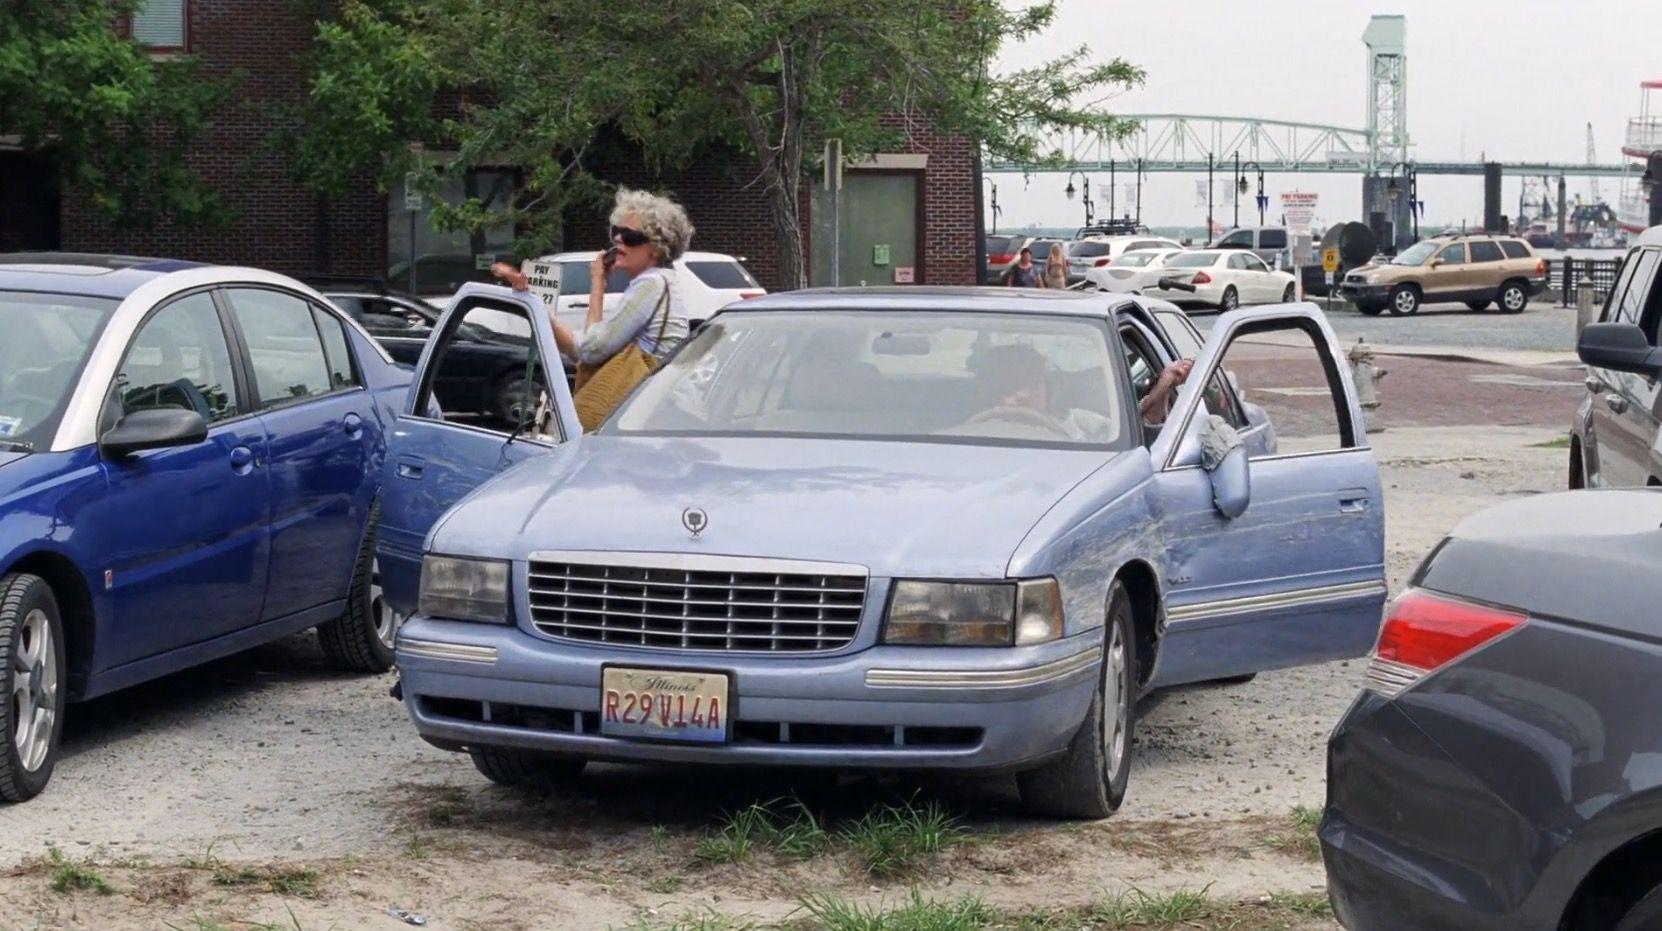 Cadillac DeVille 1997 in TAMMY 2014 cadillac  Cadillac